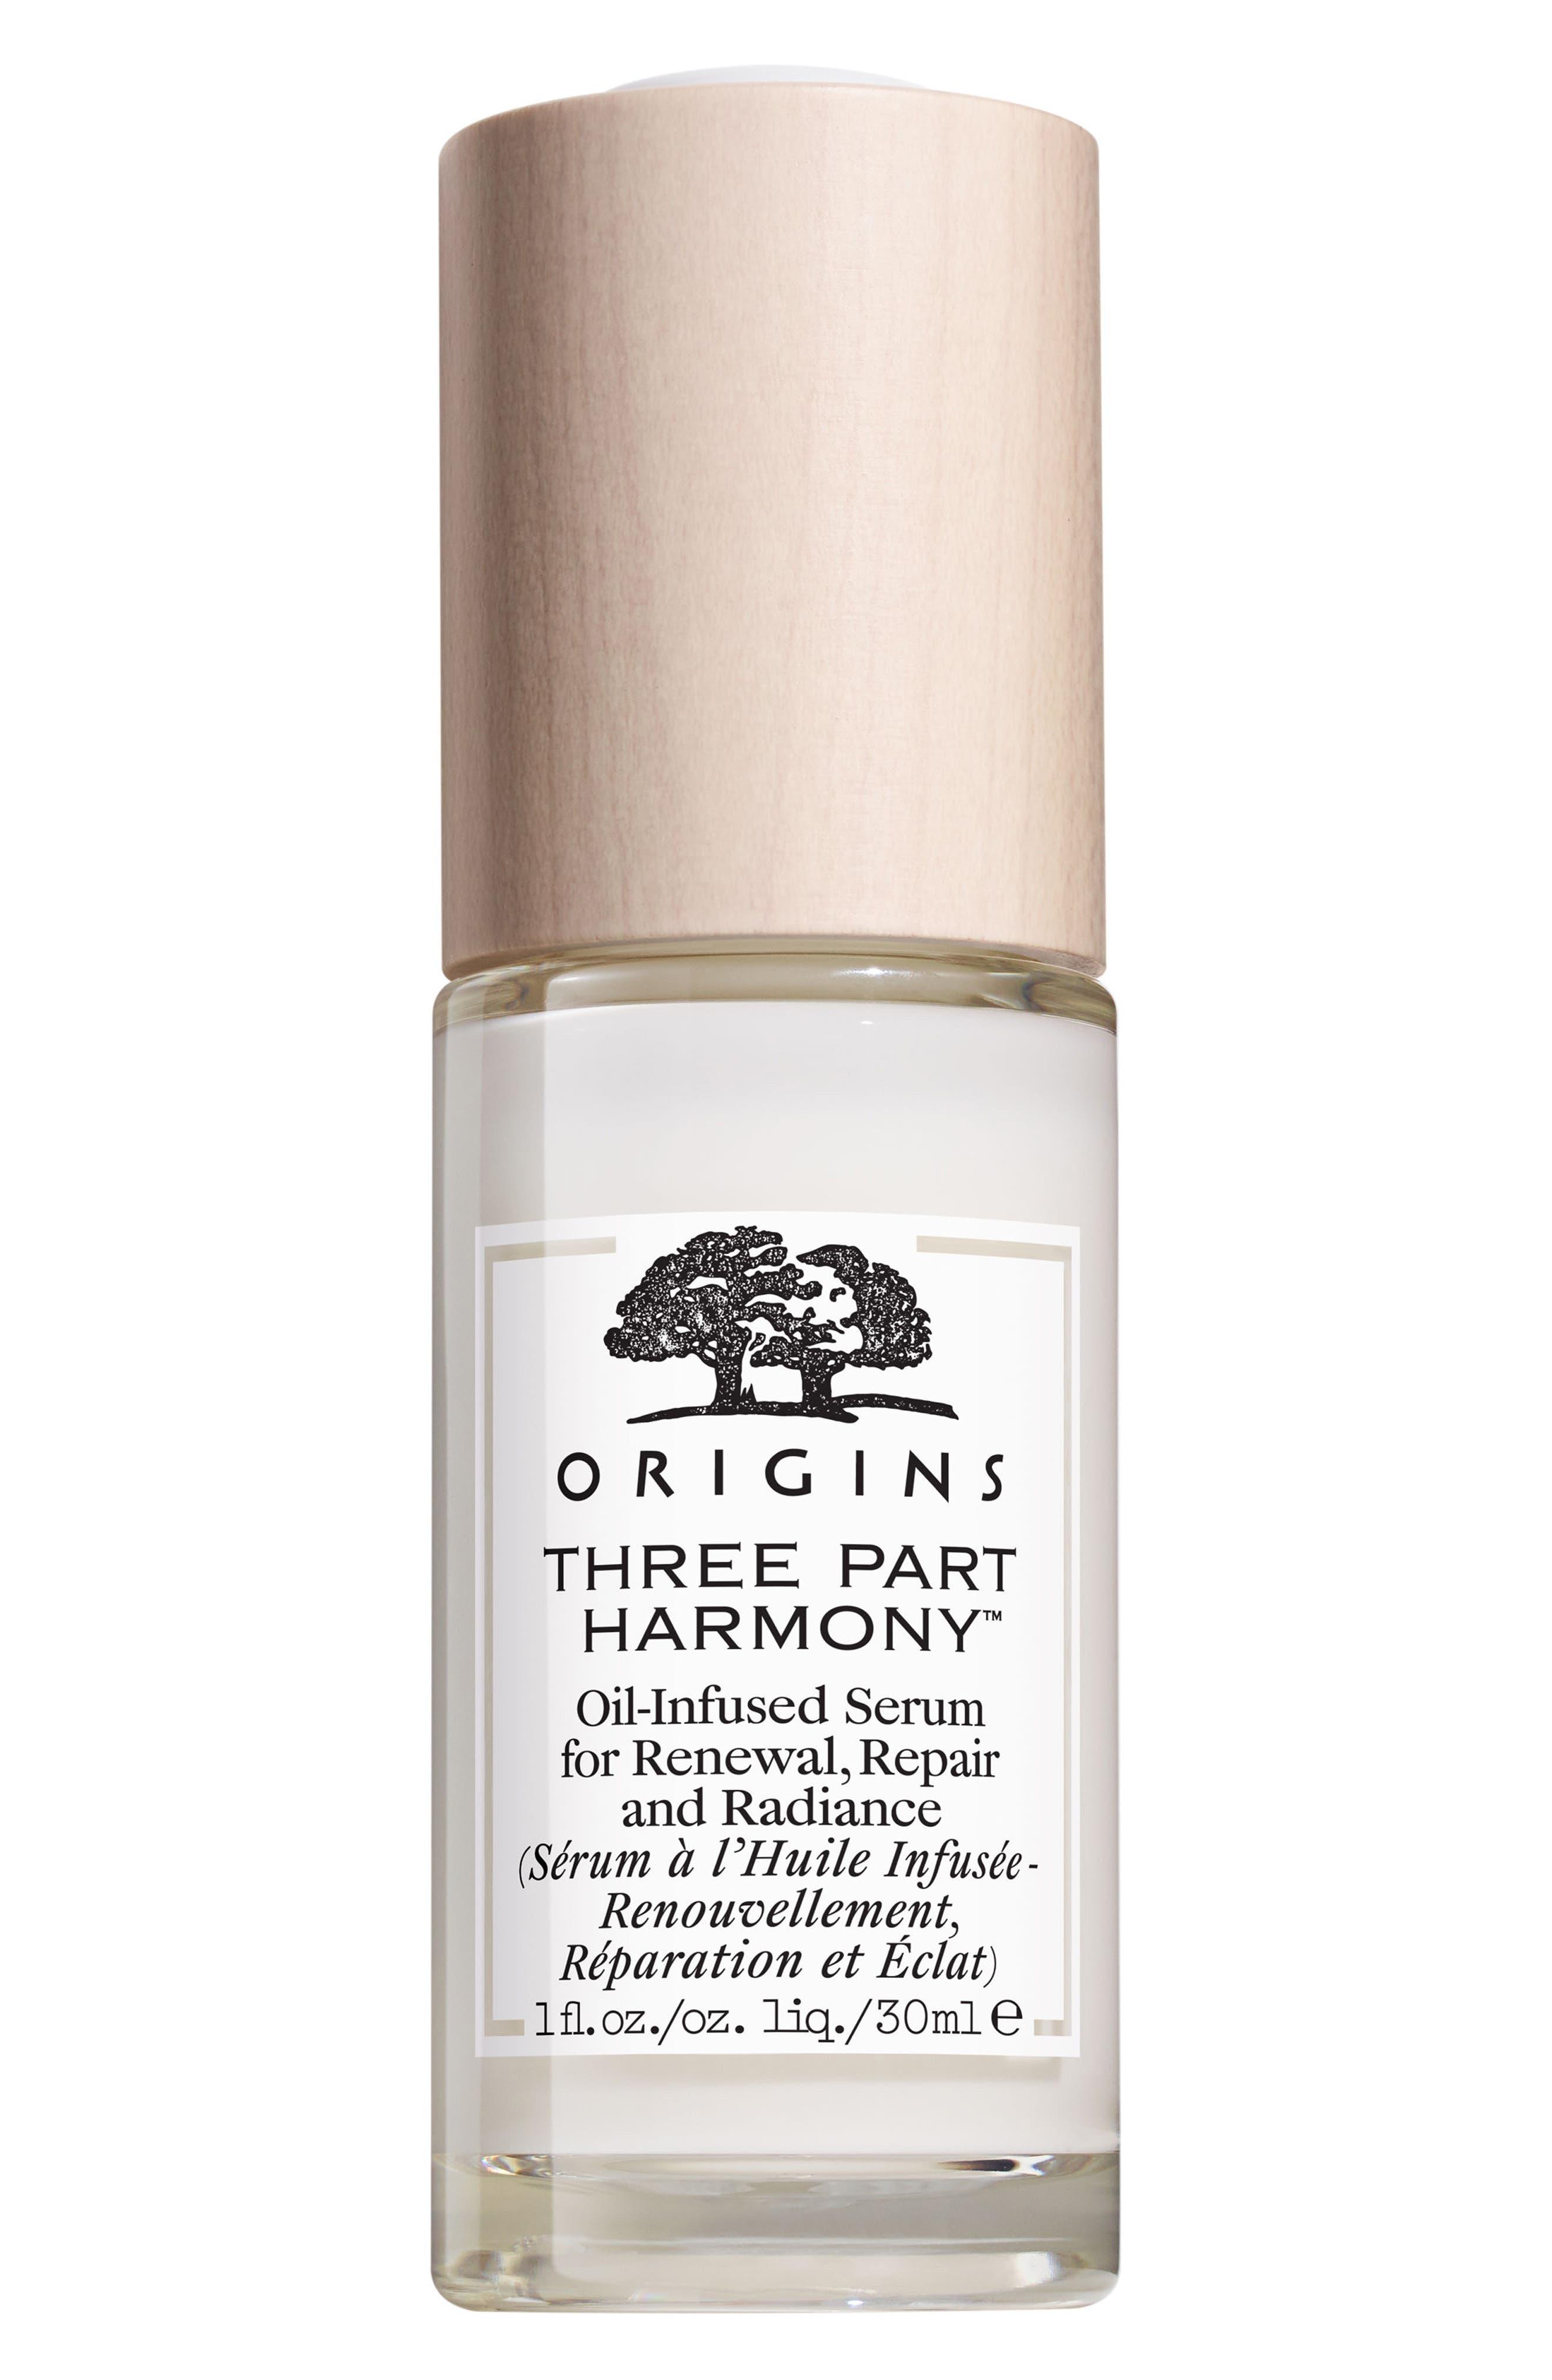 Alternate Image 1 Selected - Origins Three Part Harmony™ Oil-Infused Serum for Renewal, Repair & Radiance